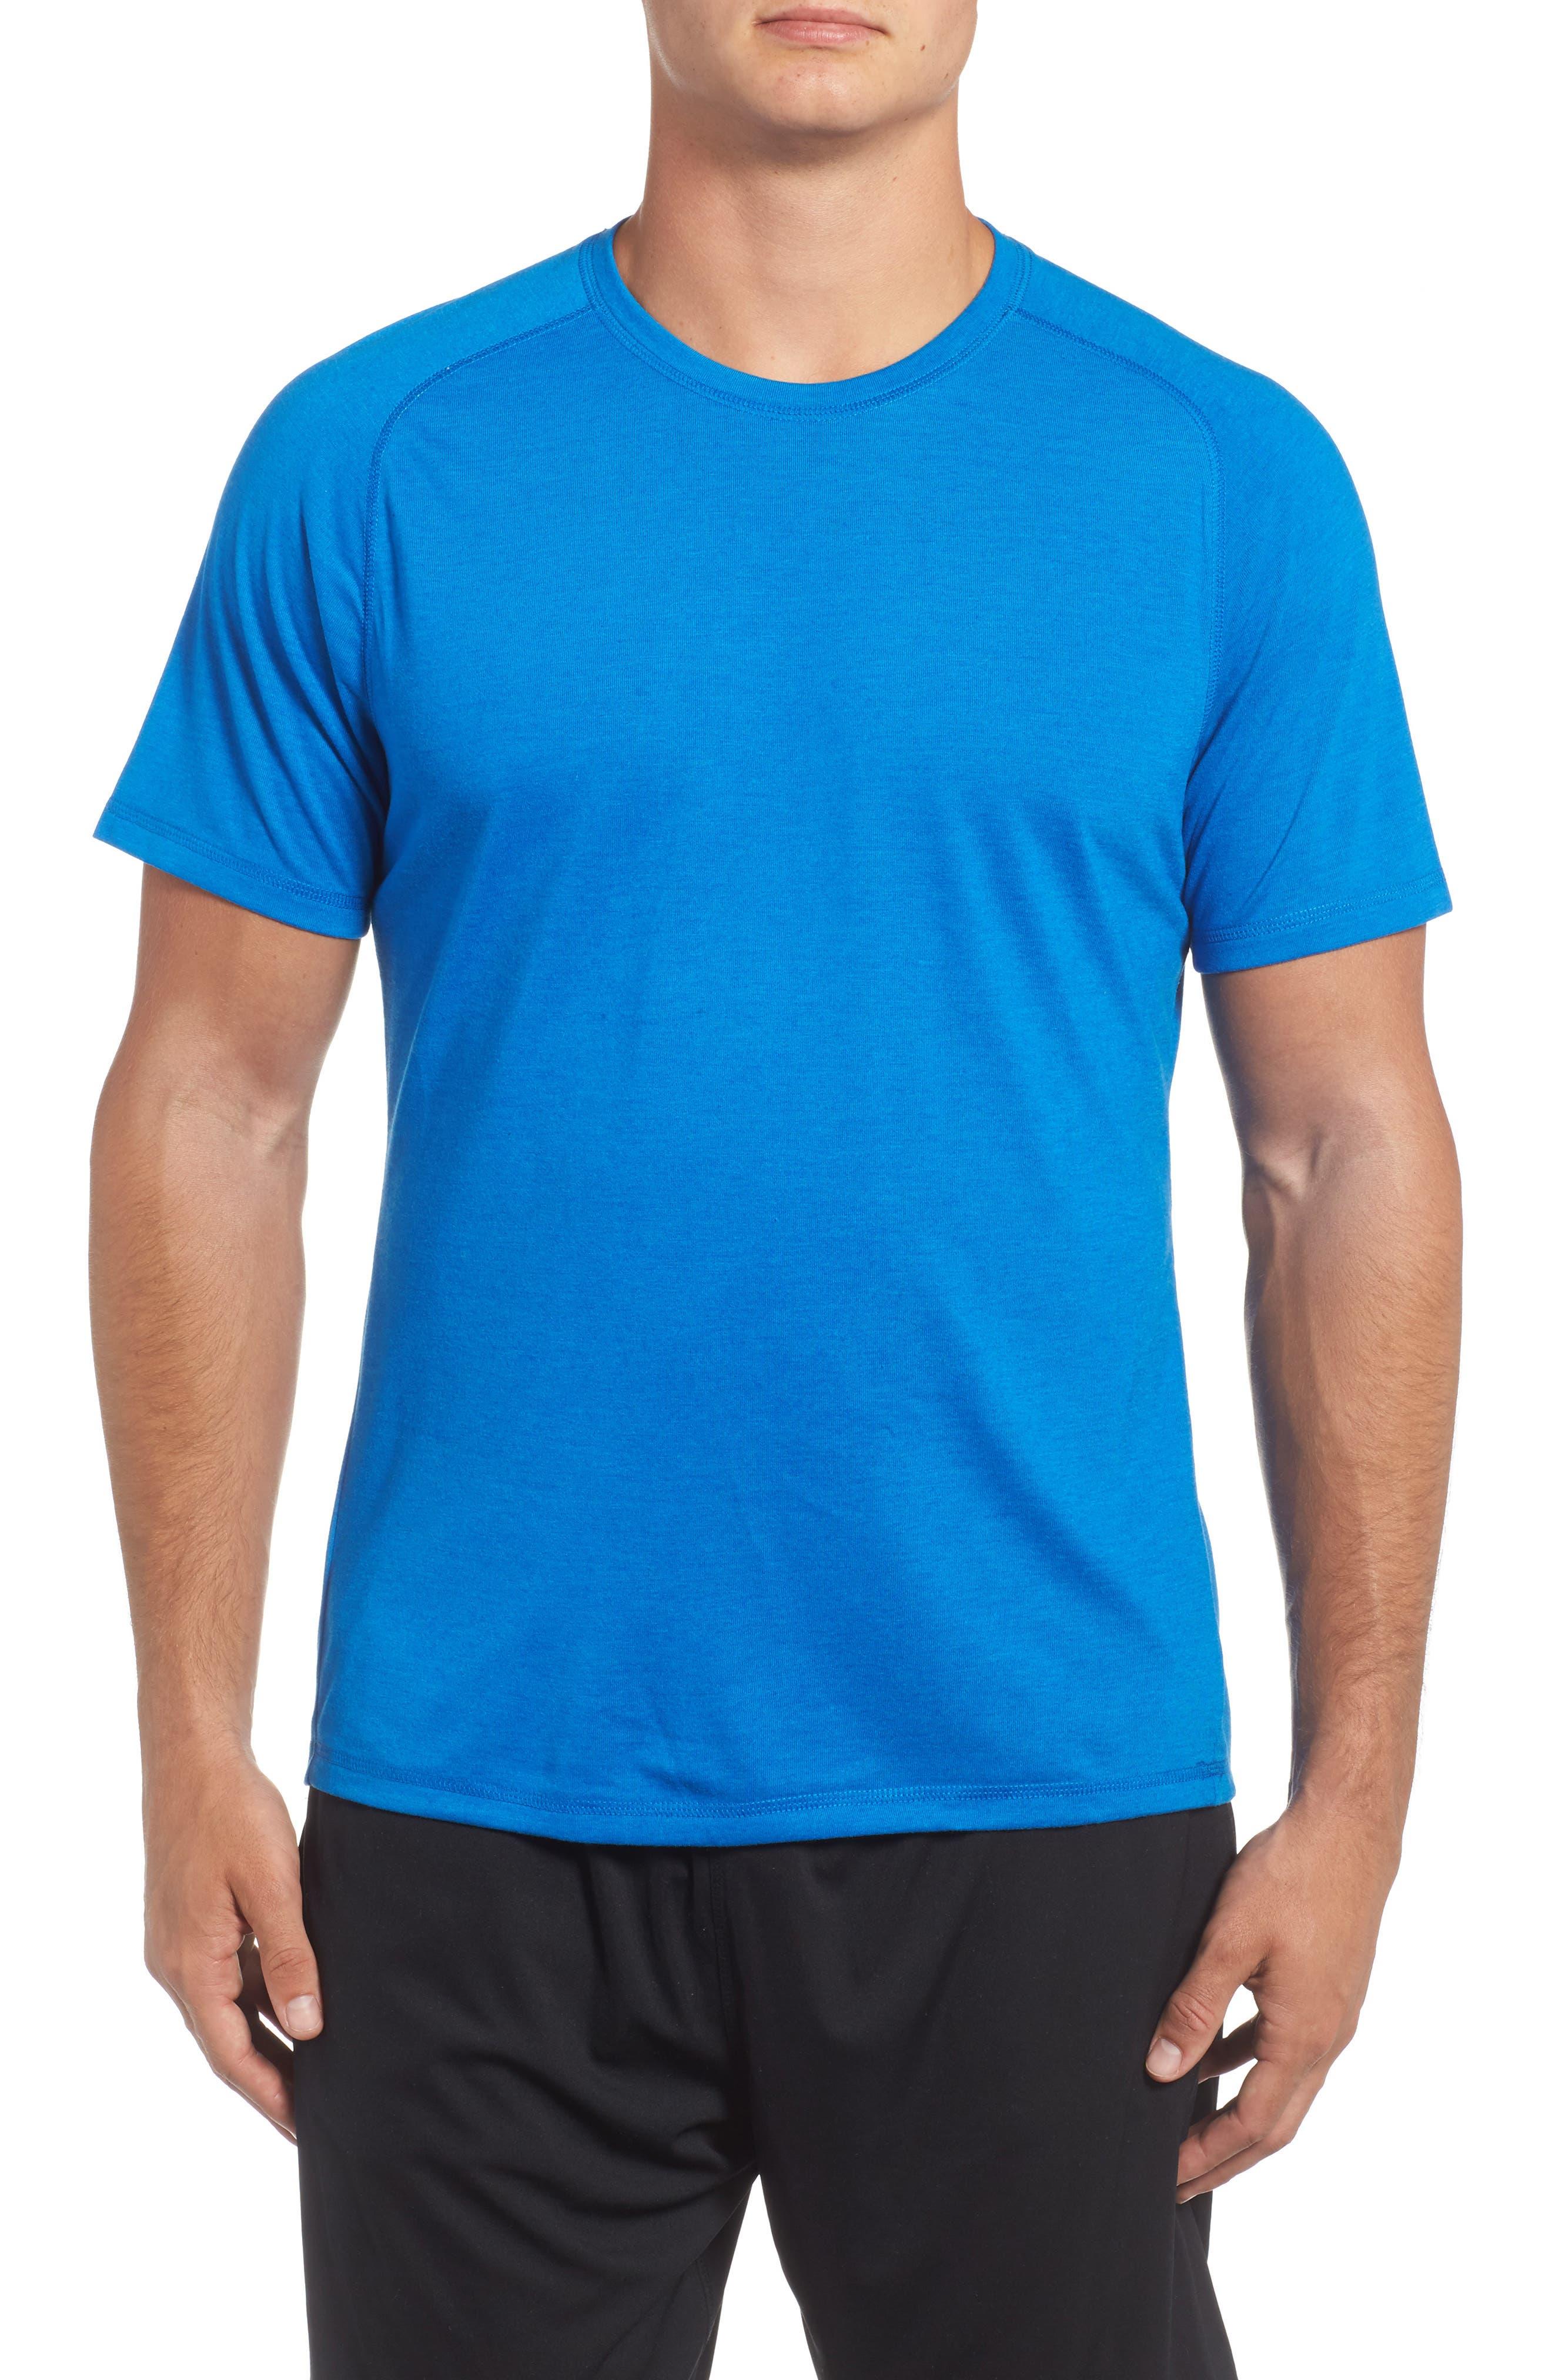 Zella Celsian Training T-Shirt